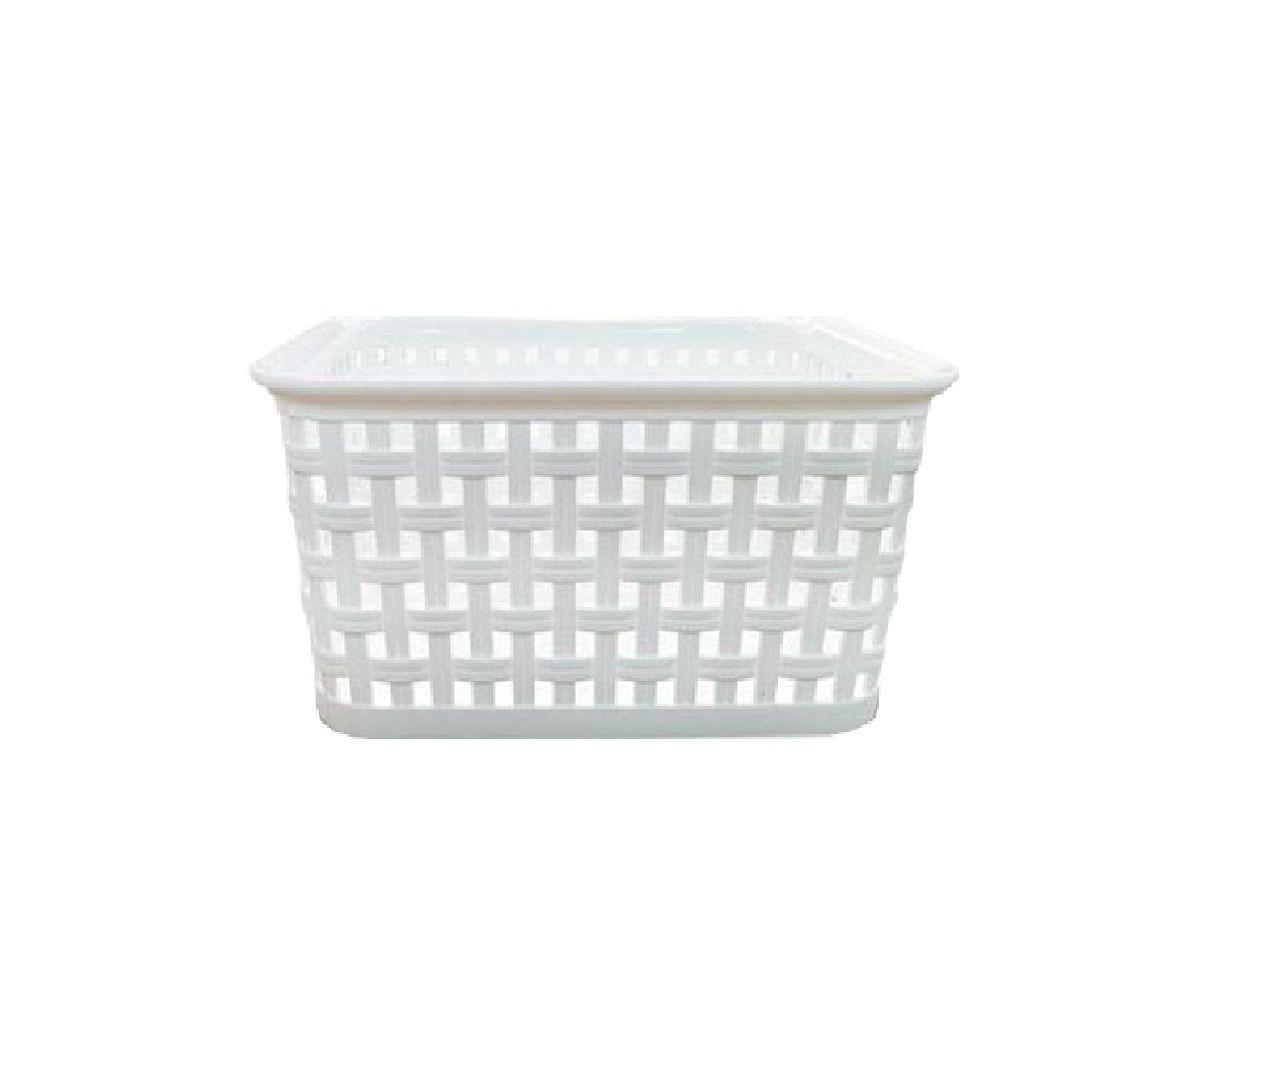 Cesto Plástico Multiuso Arca Plast Italy Branco 2,1 Litros